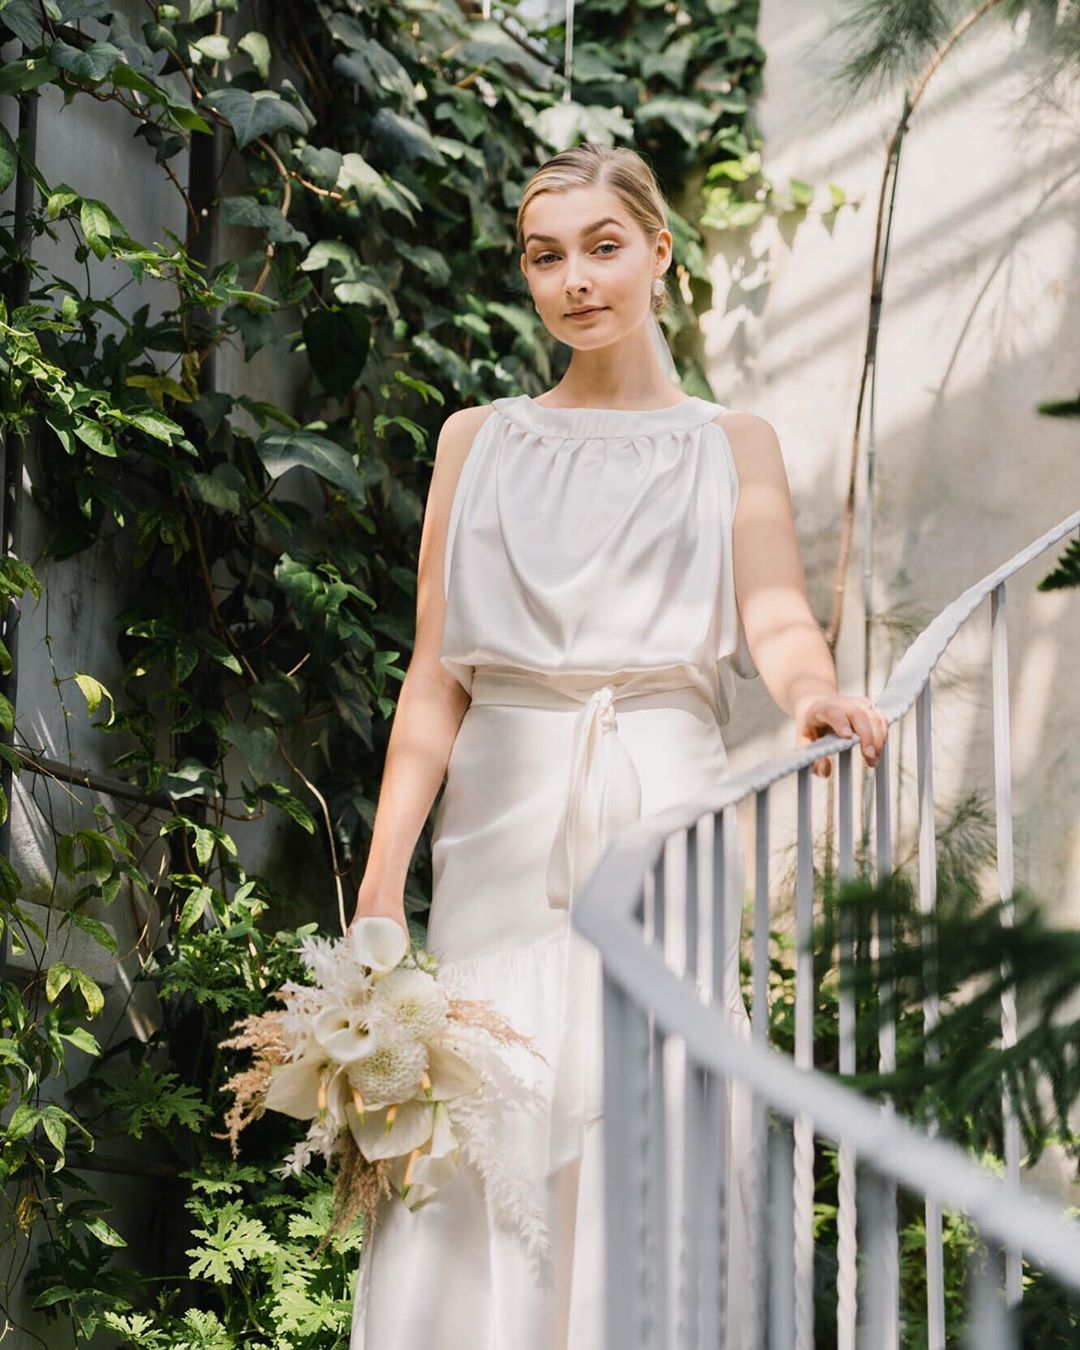 Wedding Gowns Accessories Heilibridal Instagram Kuvat Ja Videot In 2020 Bridal Gown Inspiration Wedding Gown Accessories Fall Wedding Dresses